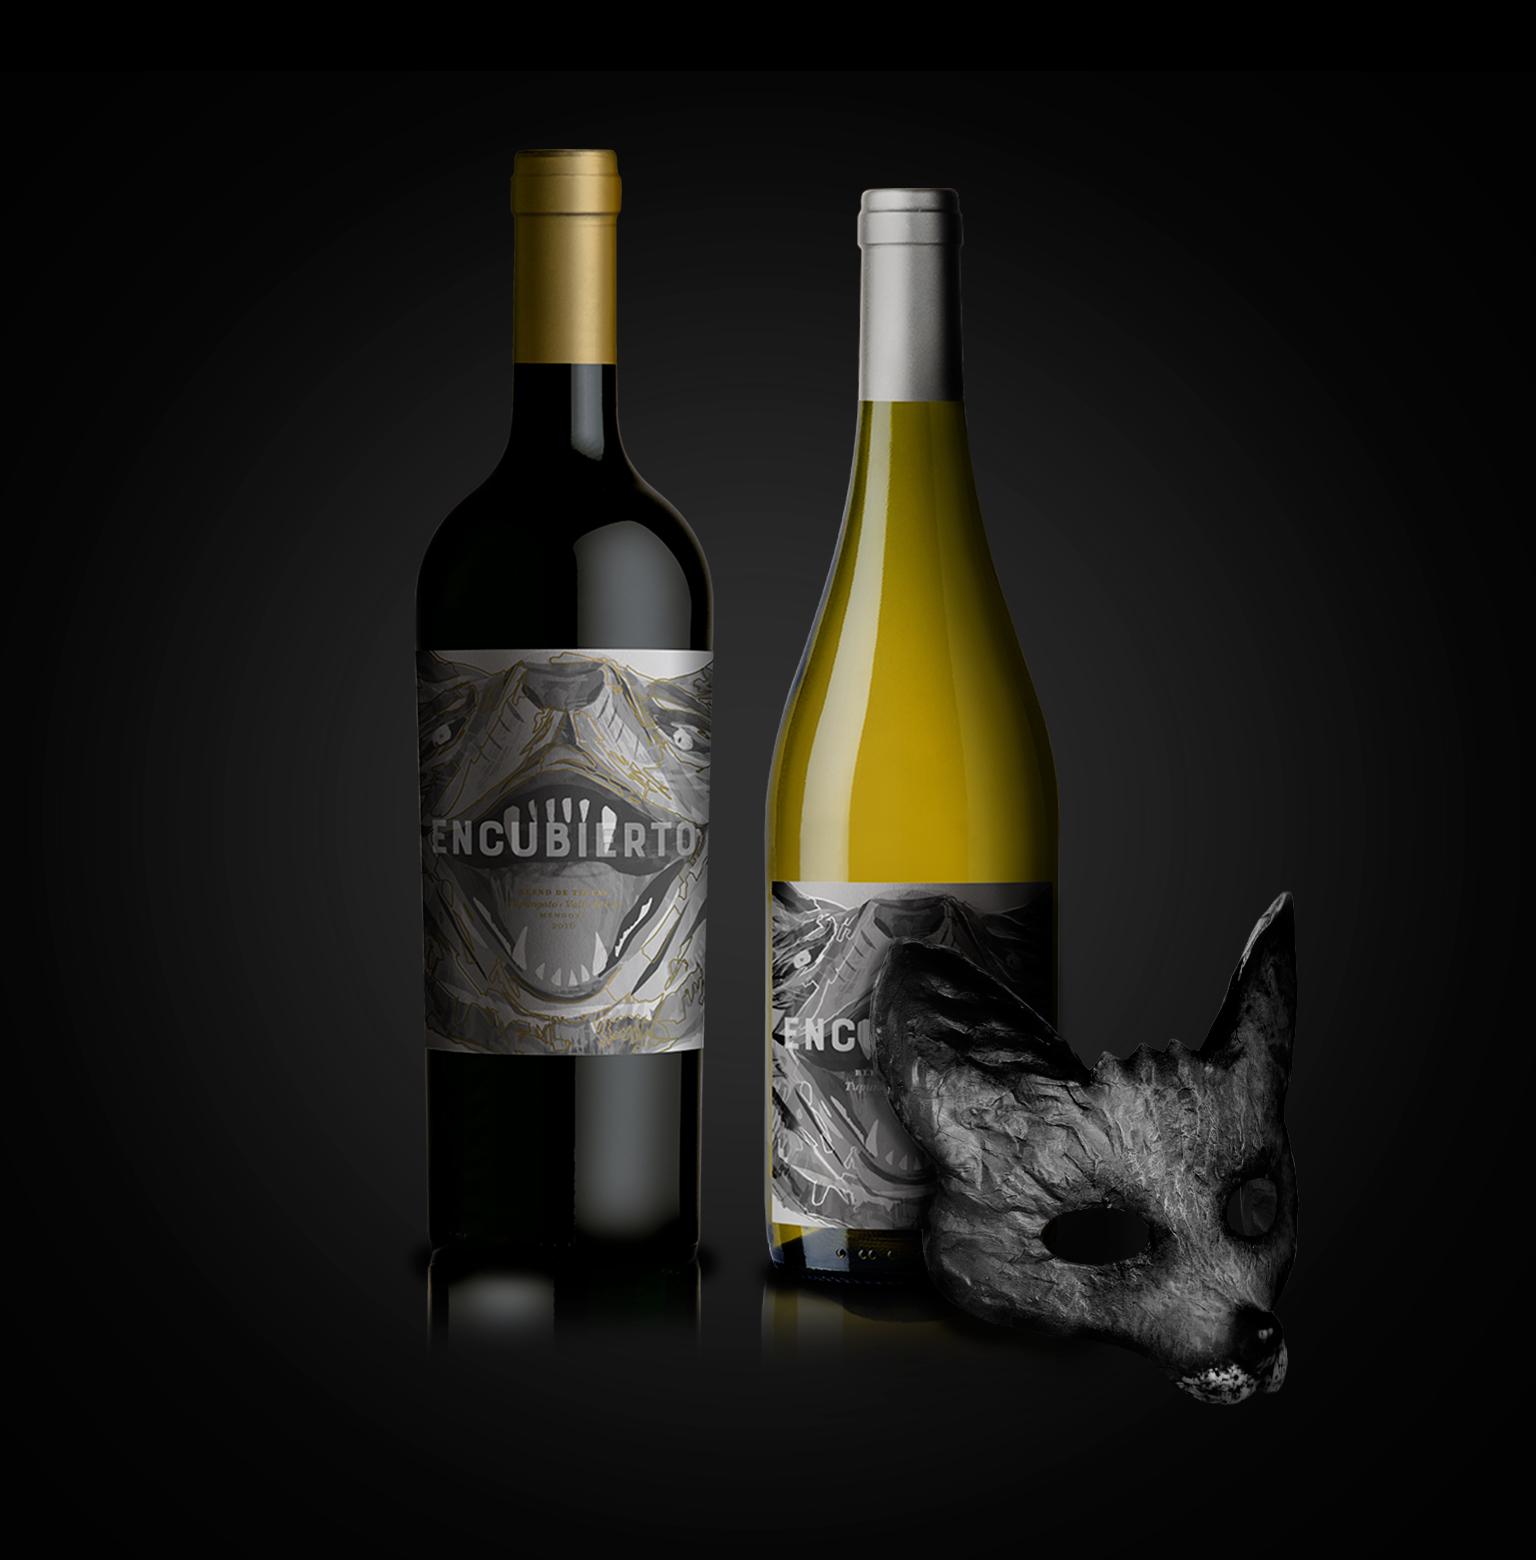 Encubierto-Blend-Vino-Caliptra